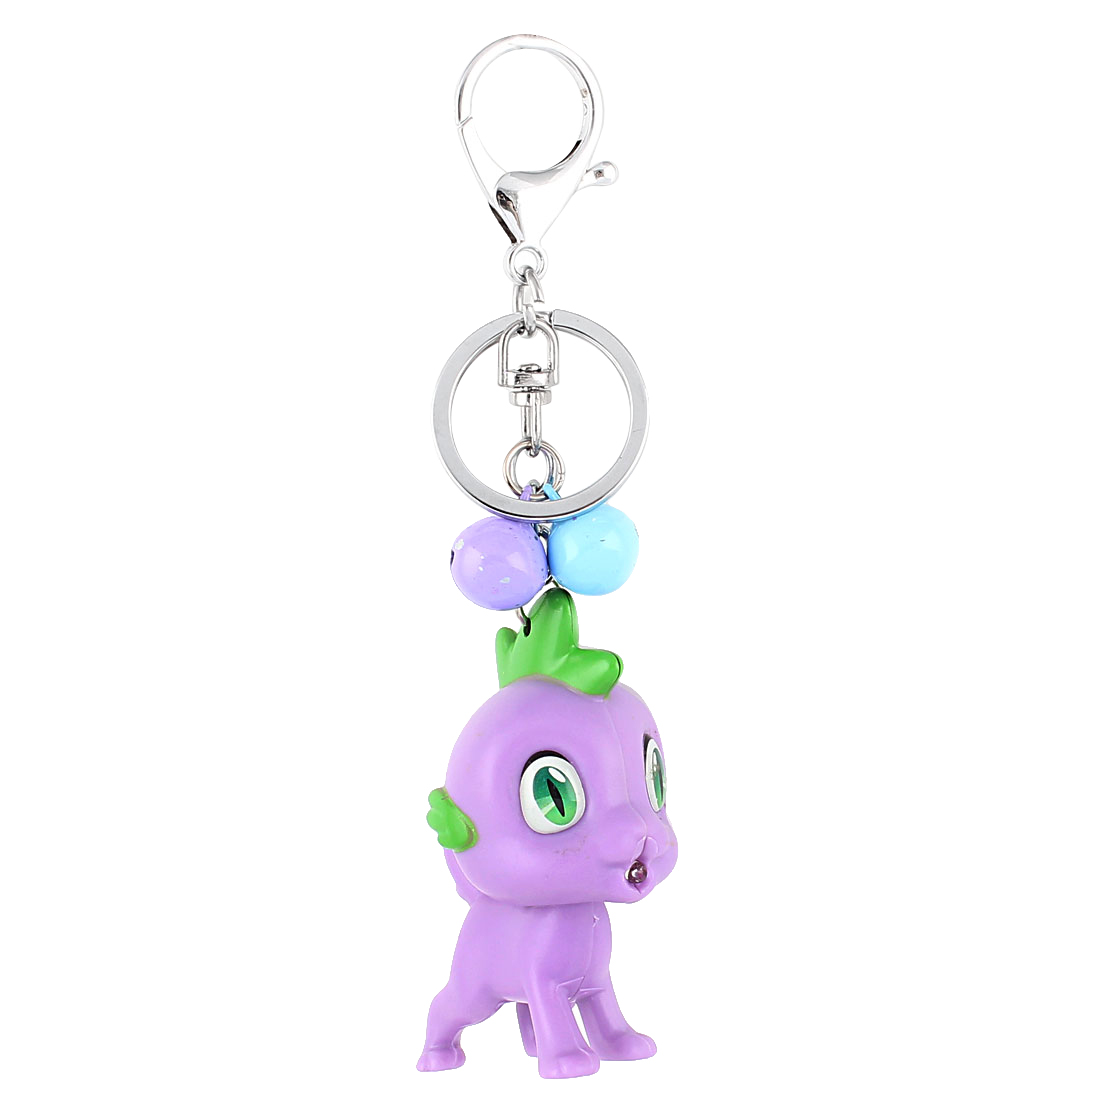 Kids Christmas Gift Bells Unicorn Pendant LED Flash Light Sound Keychain Purple